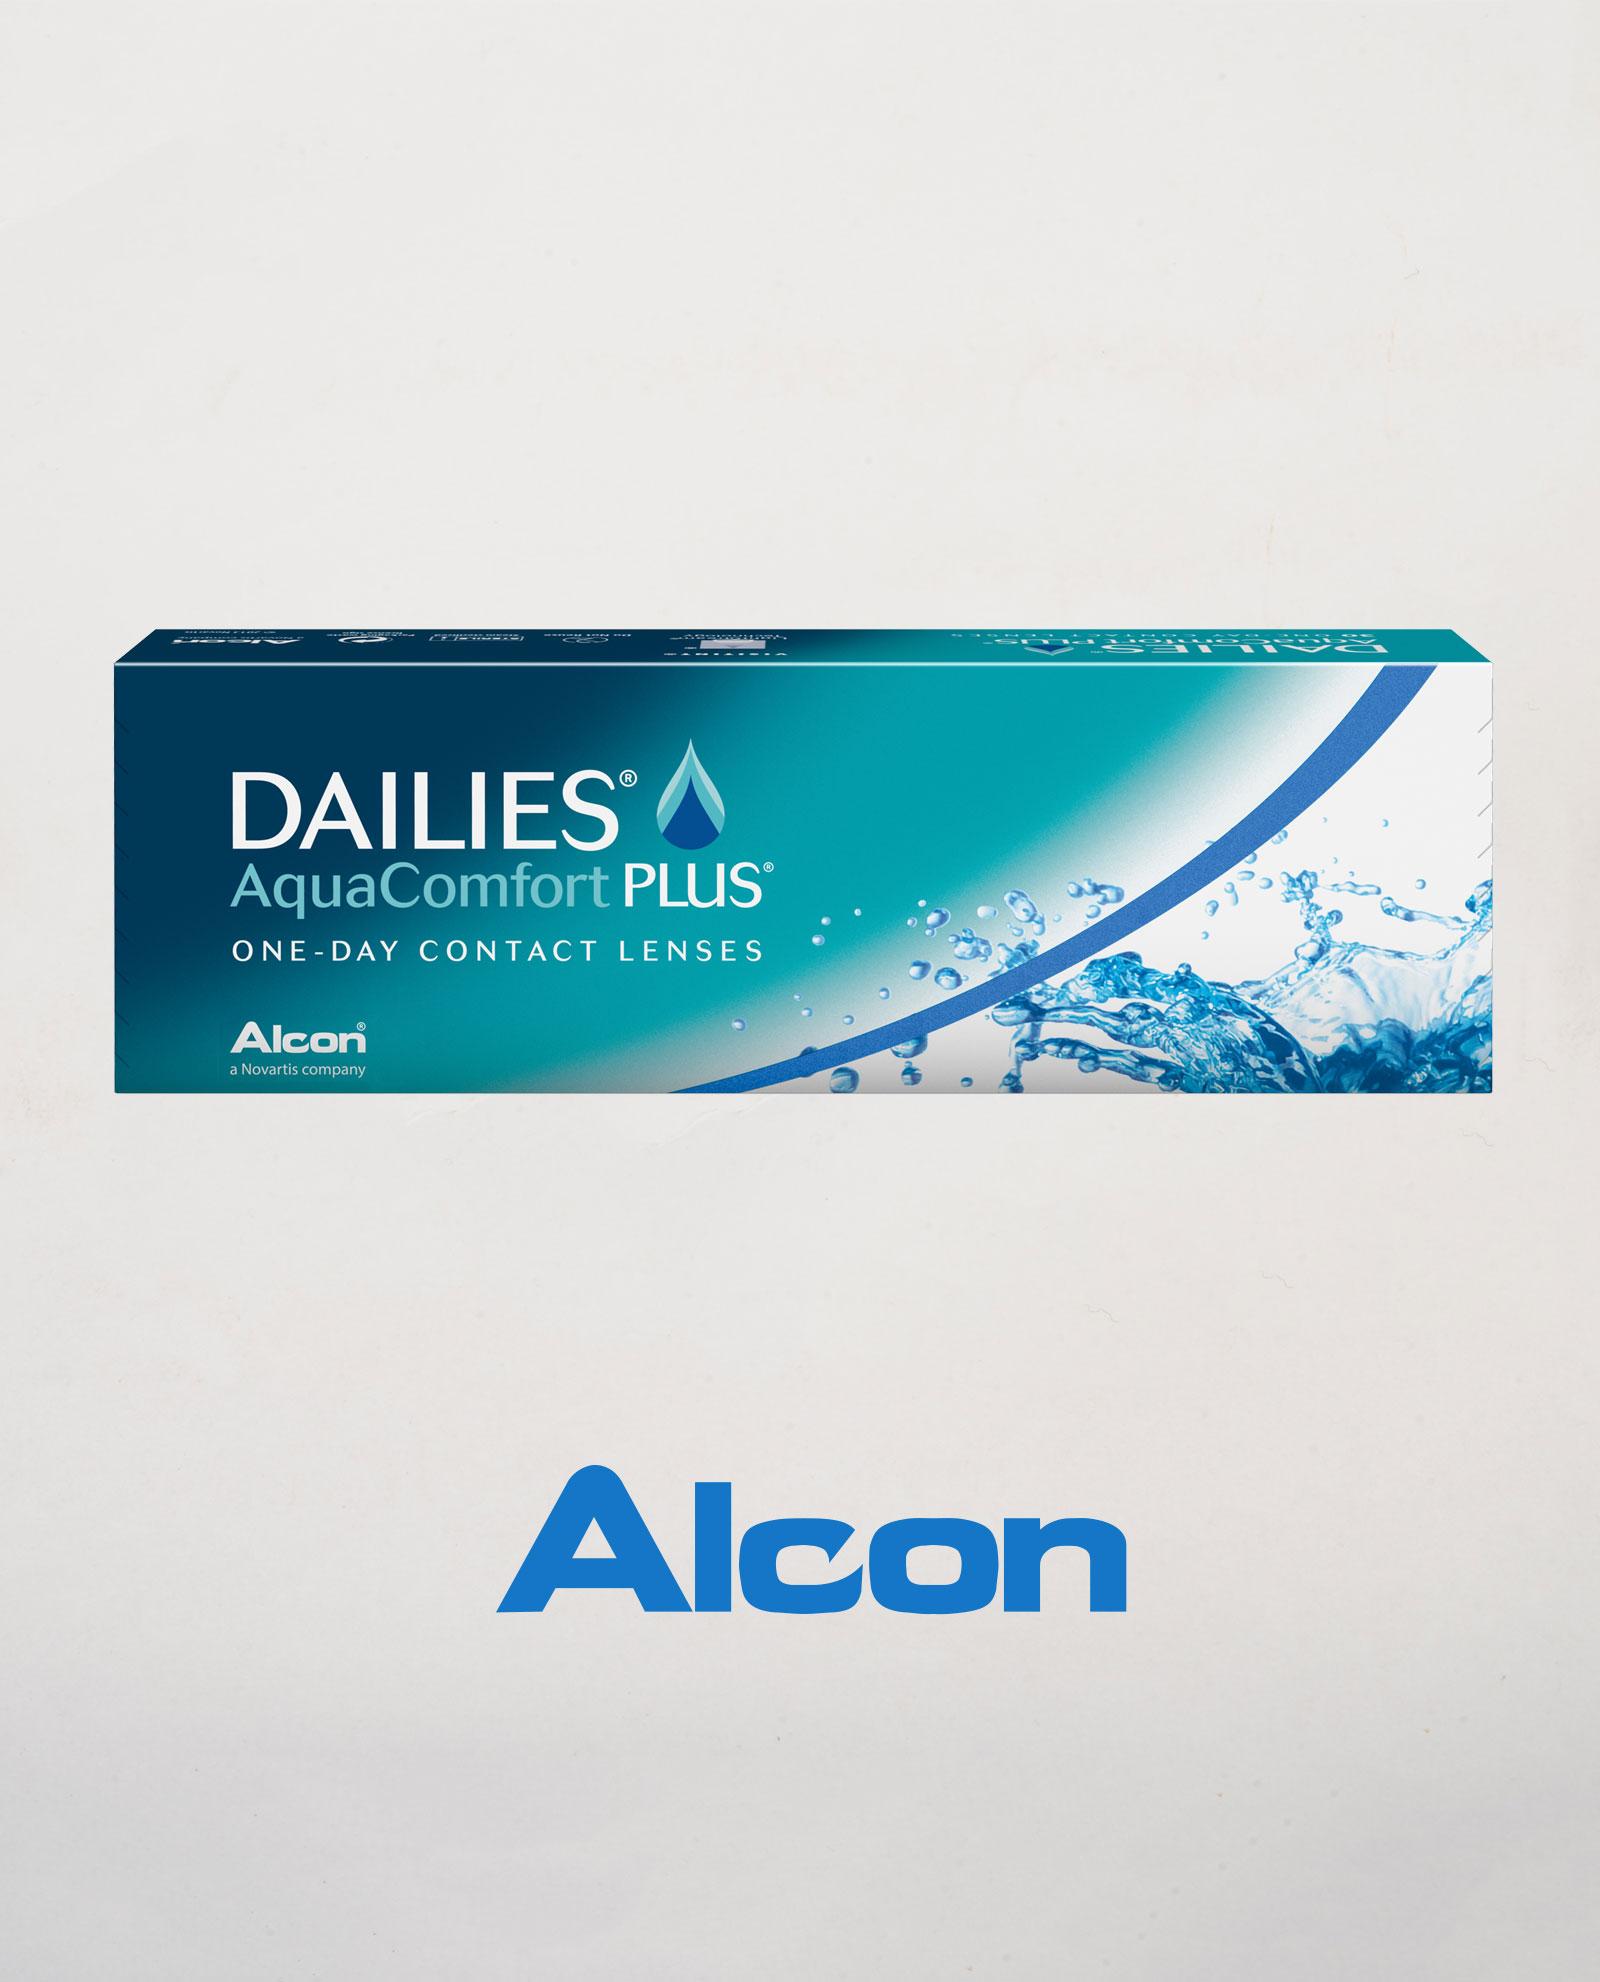 lenses dailies eyesite toric buy comfort plus acp shop aqua comforter contact